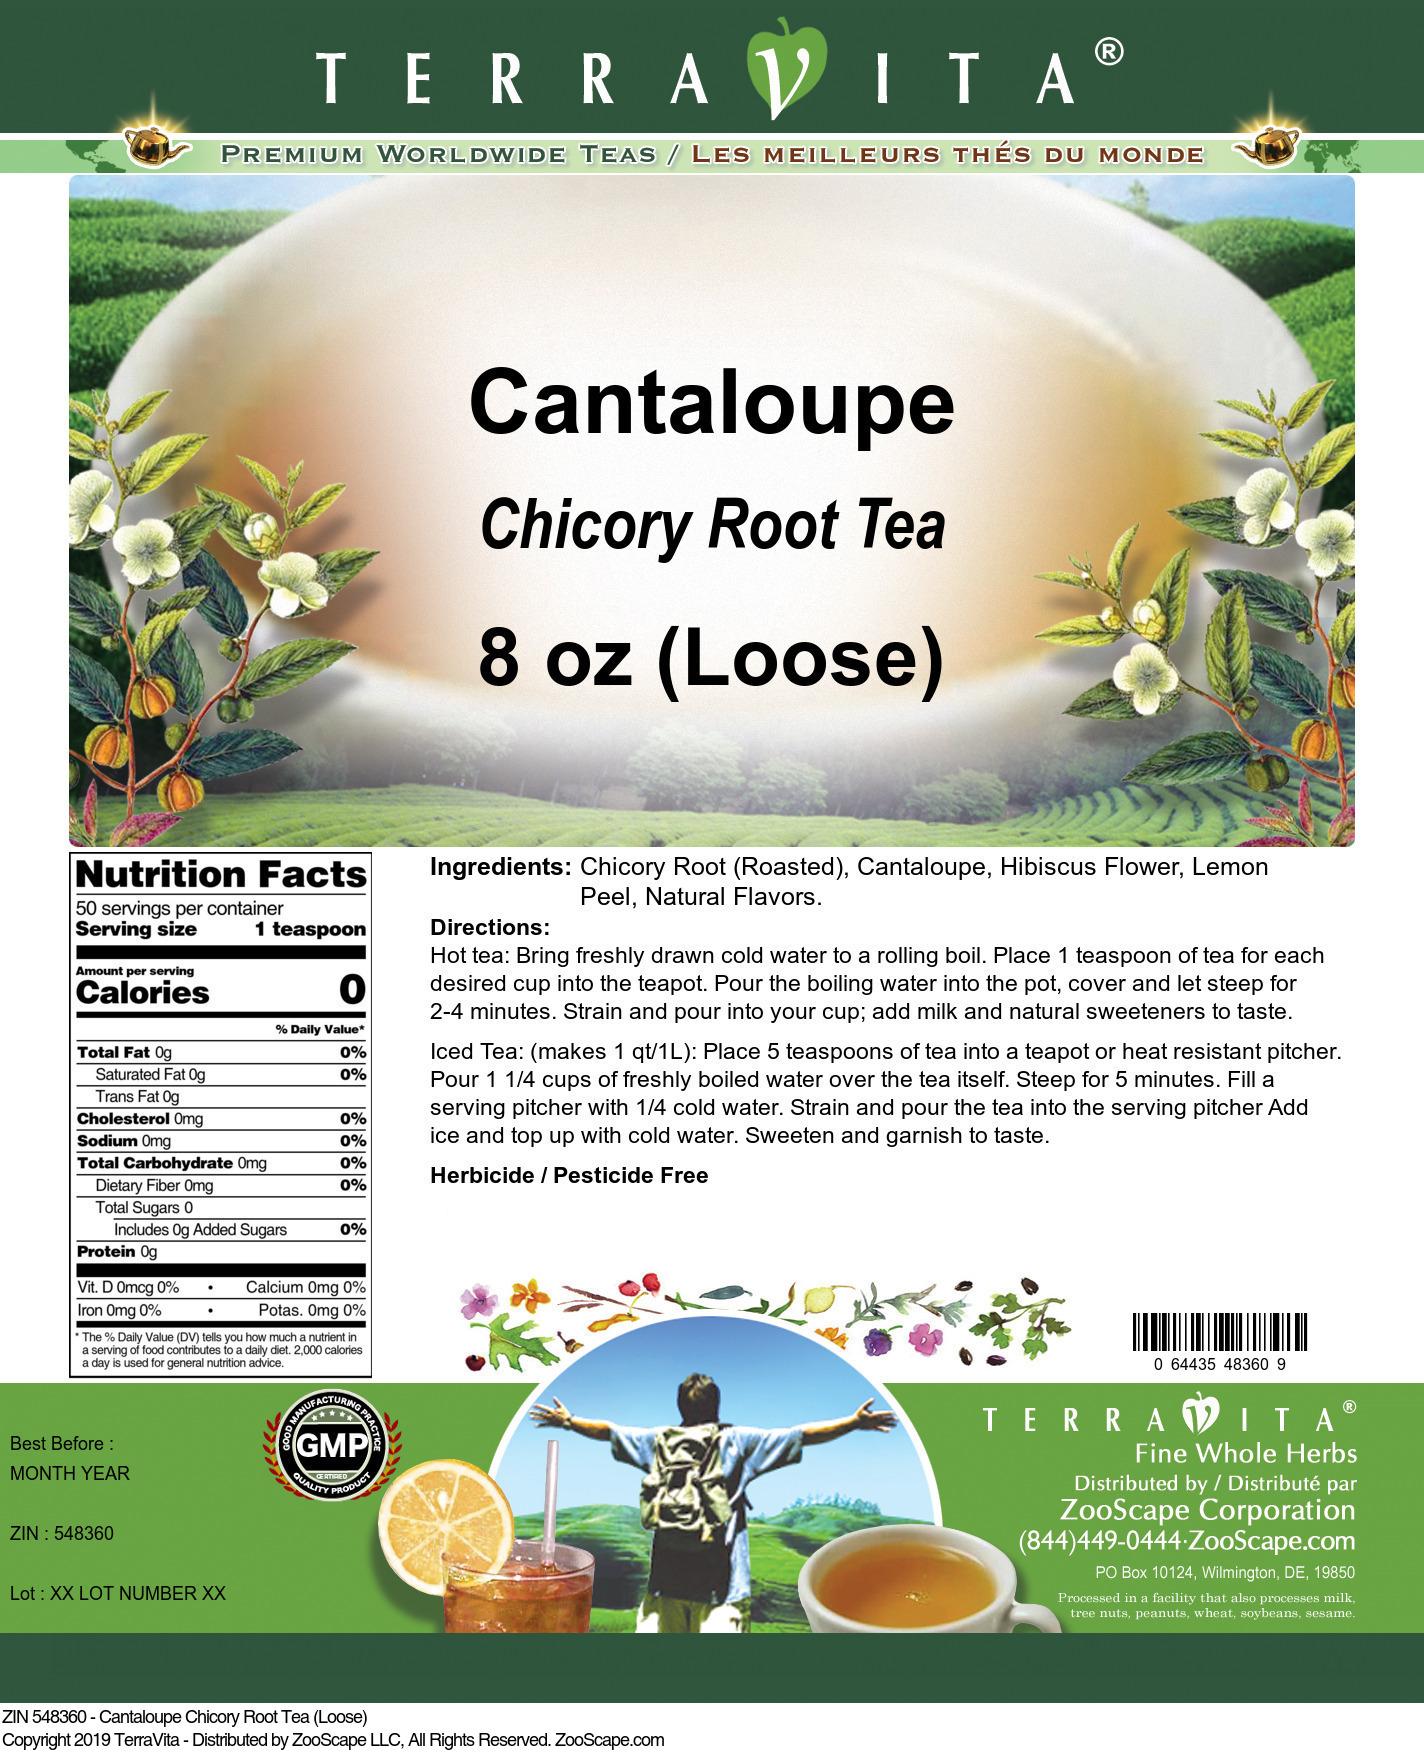 Cantaloupe Chicory Root Tea (Loose)